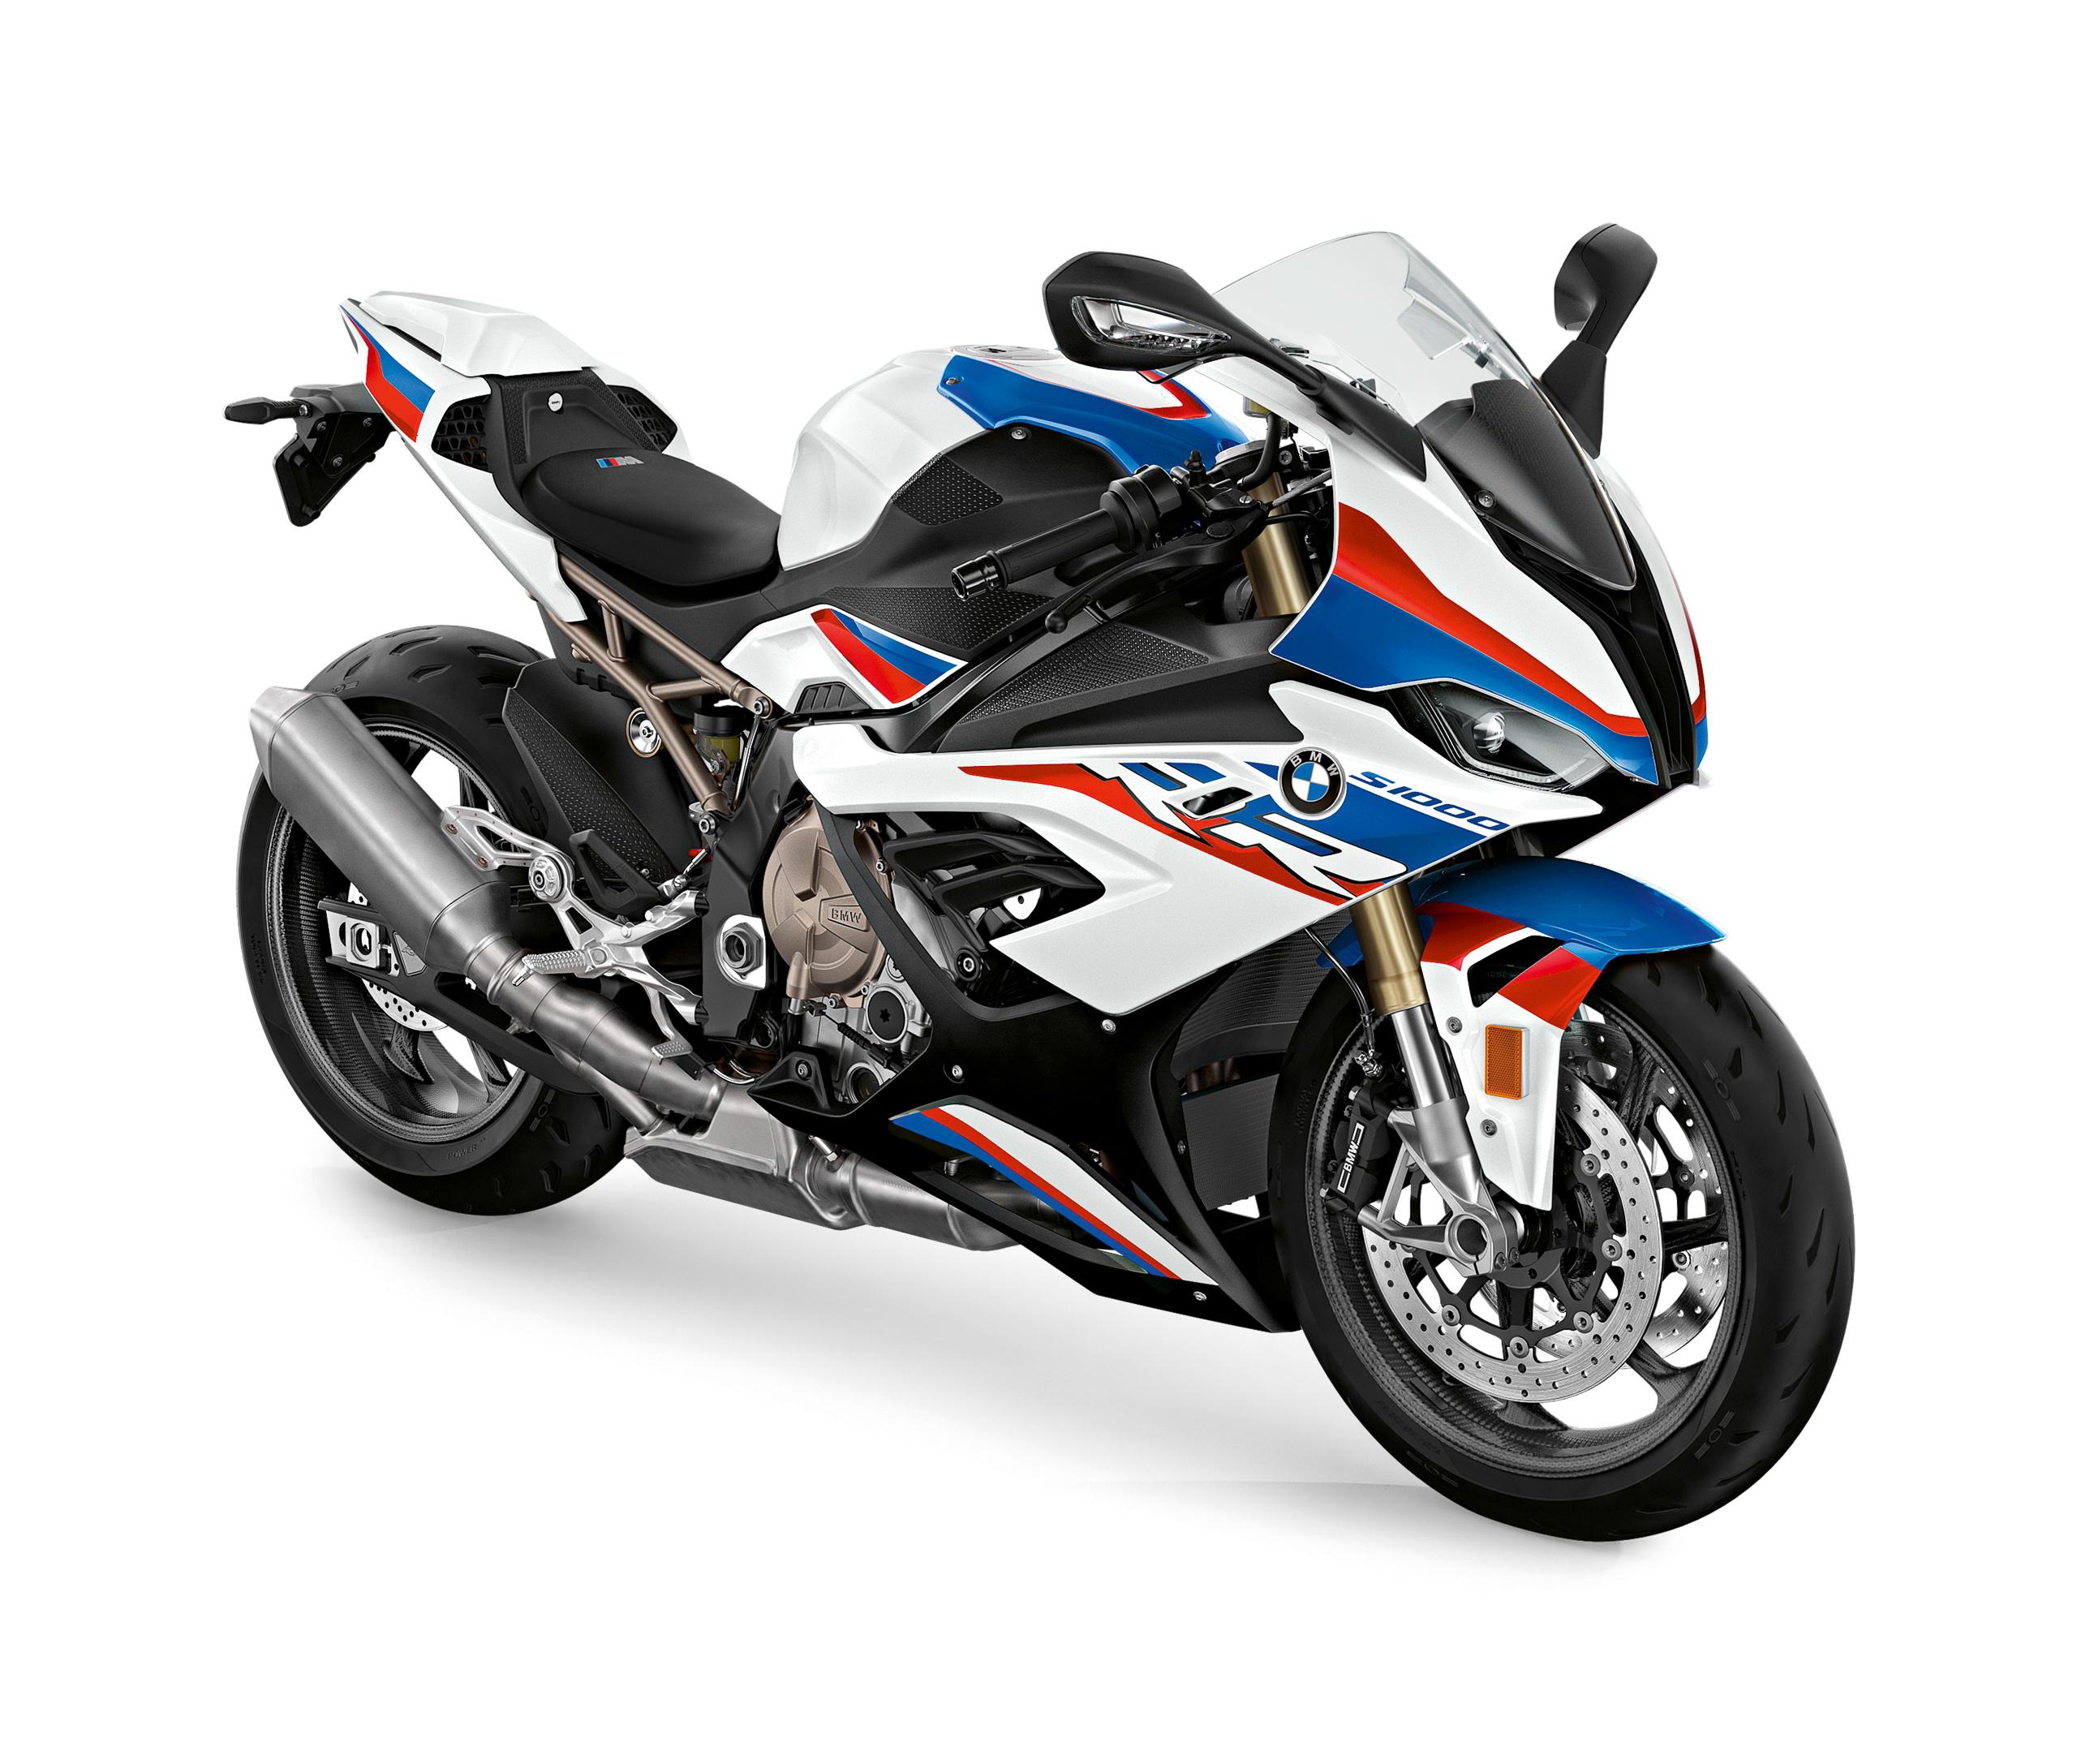 2018 Eicma 2019 Bmw Motorrad S 1000 Rr Shown Paul Tan Image 884917